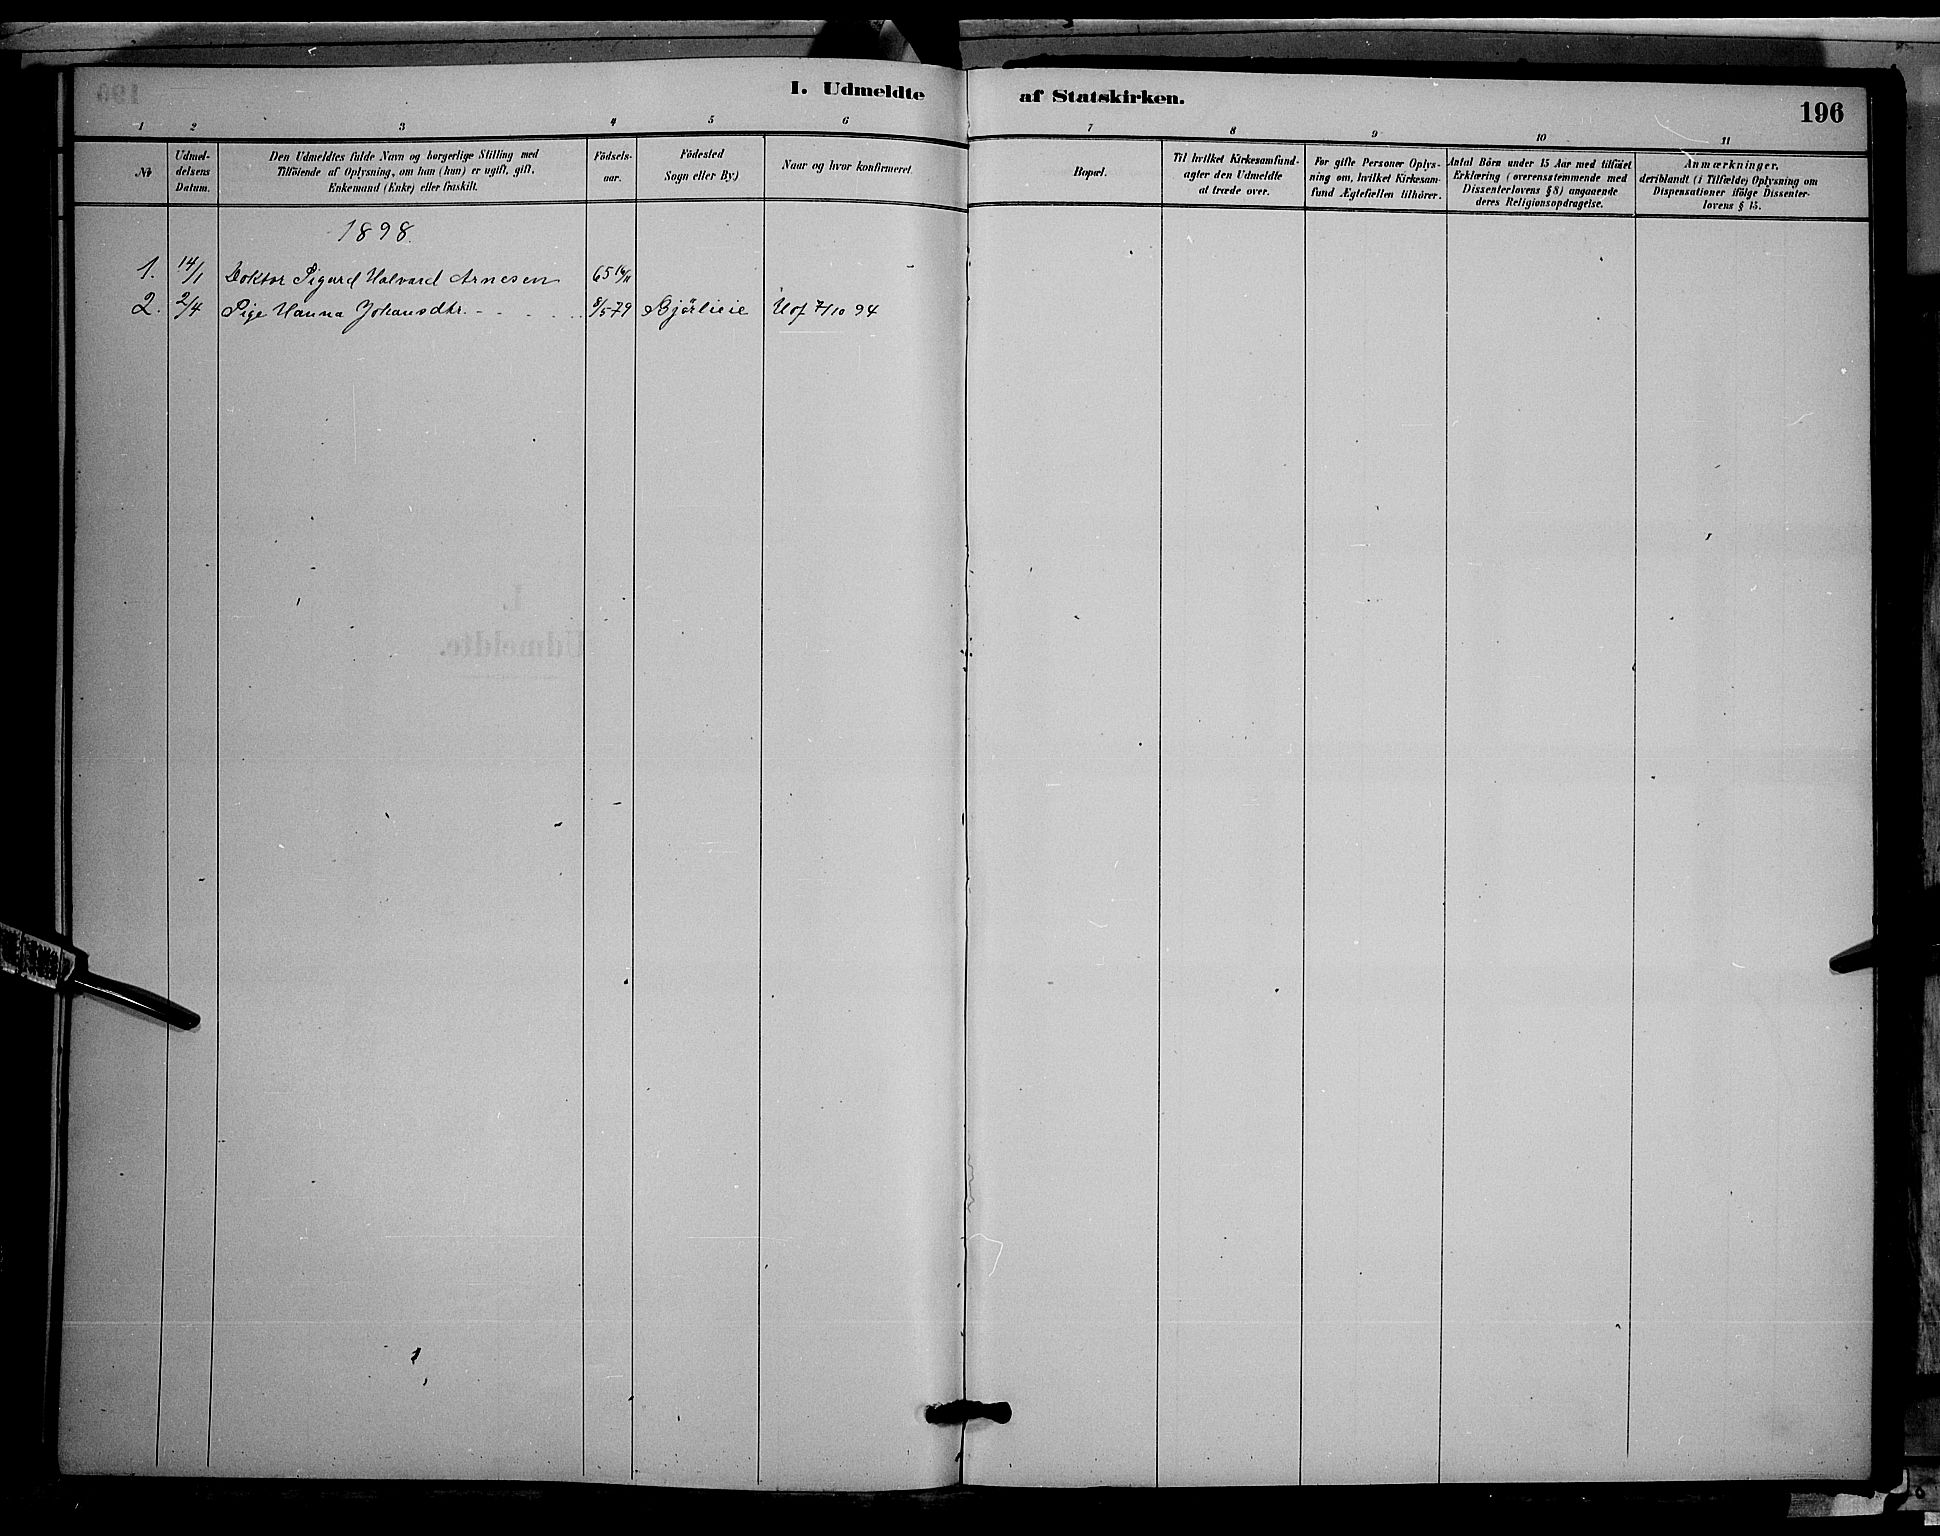 SAH, Søndre Land prestekontor, L/L0002: Klokkerbok nr. 2, 1884-1900, s. 196